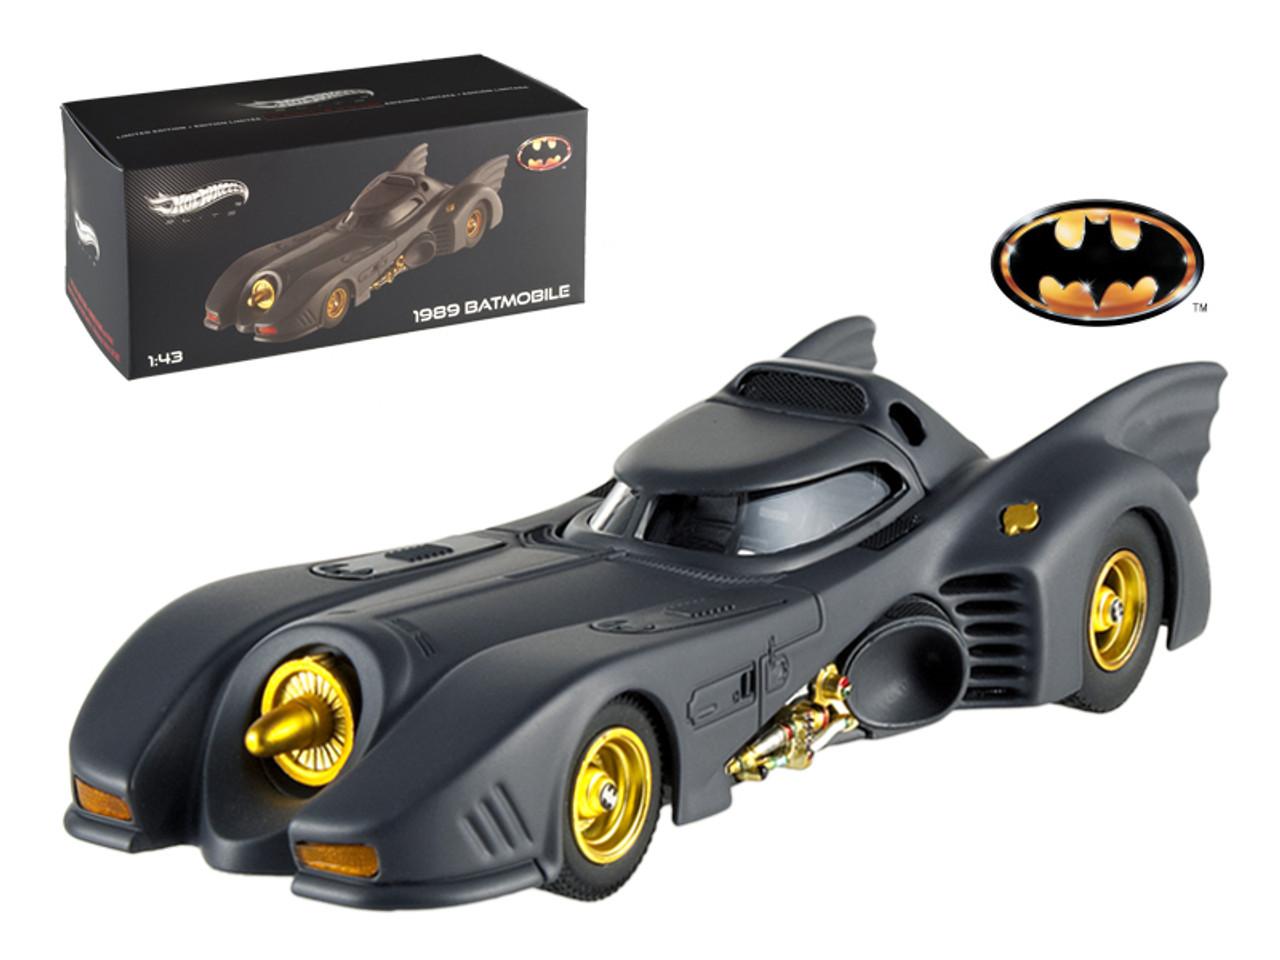 1/43 Hot Wheels Hotwheels 1989 Movie Batmobile Elite Edition Diecast Car Model